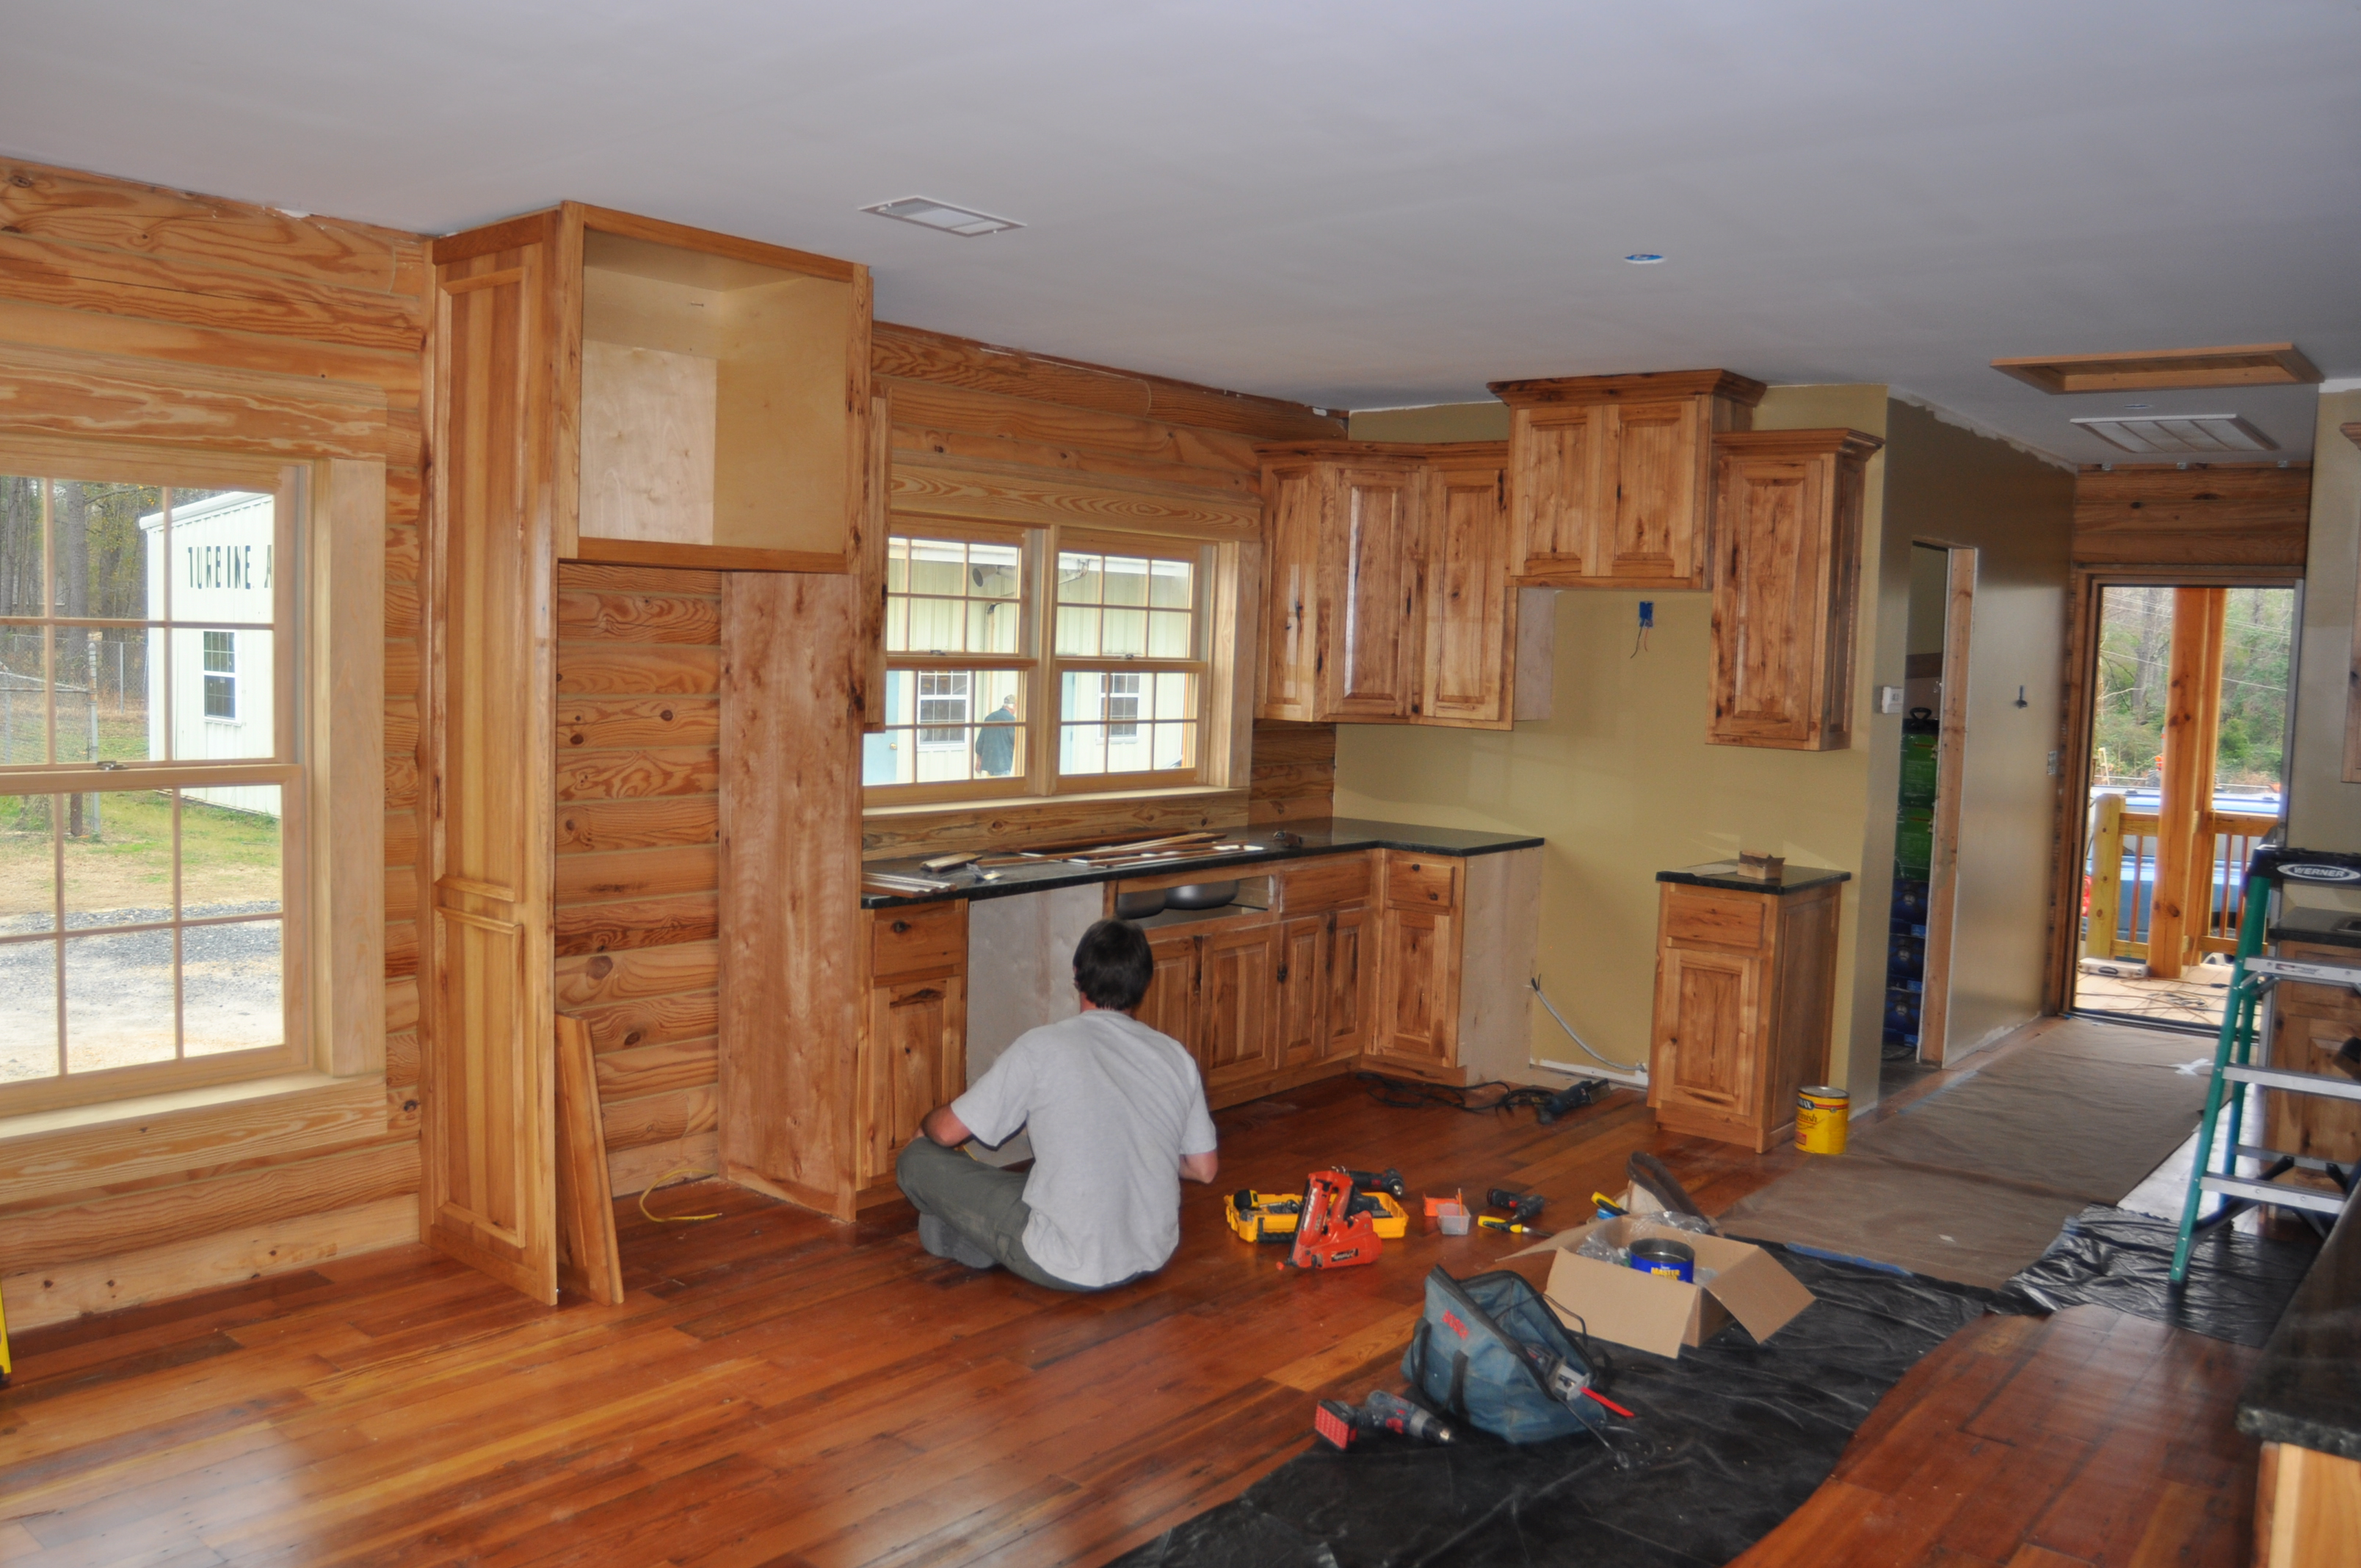 Hickory cabinets (knotty) ._01 09 2013_0002